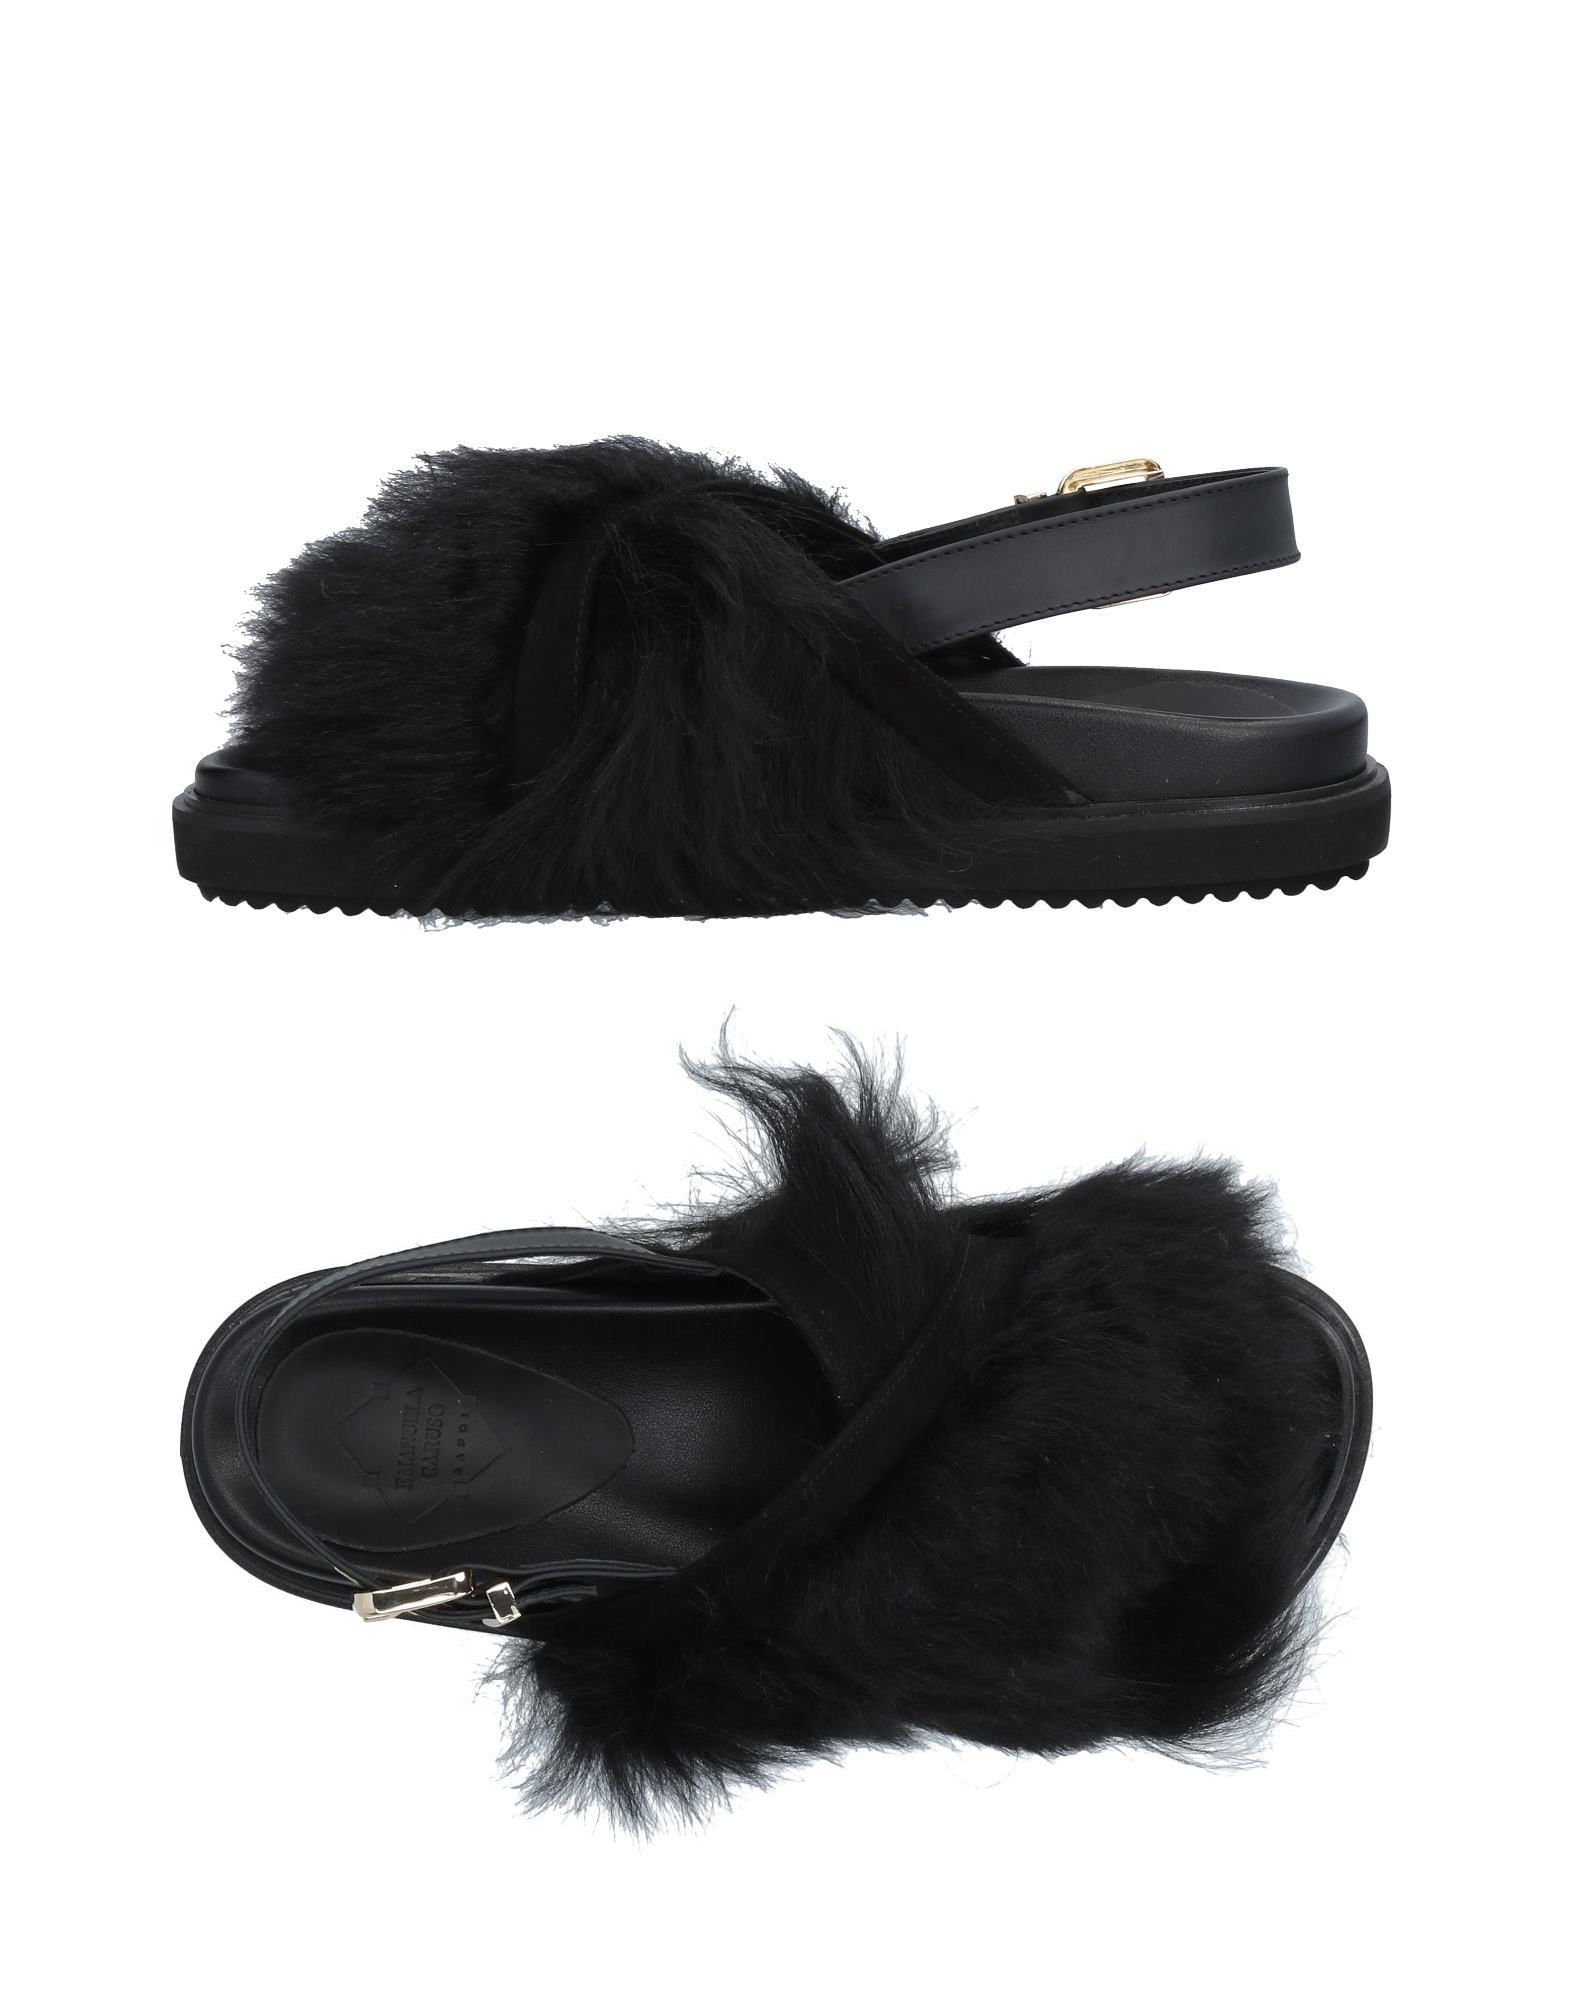 Emanuela Caruso Capri Sandalen Damen  11491609CC Gute Qualität beliebte Schuhe